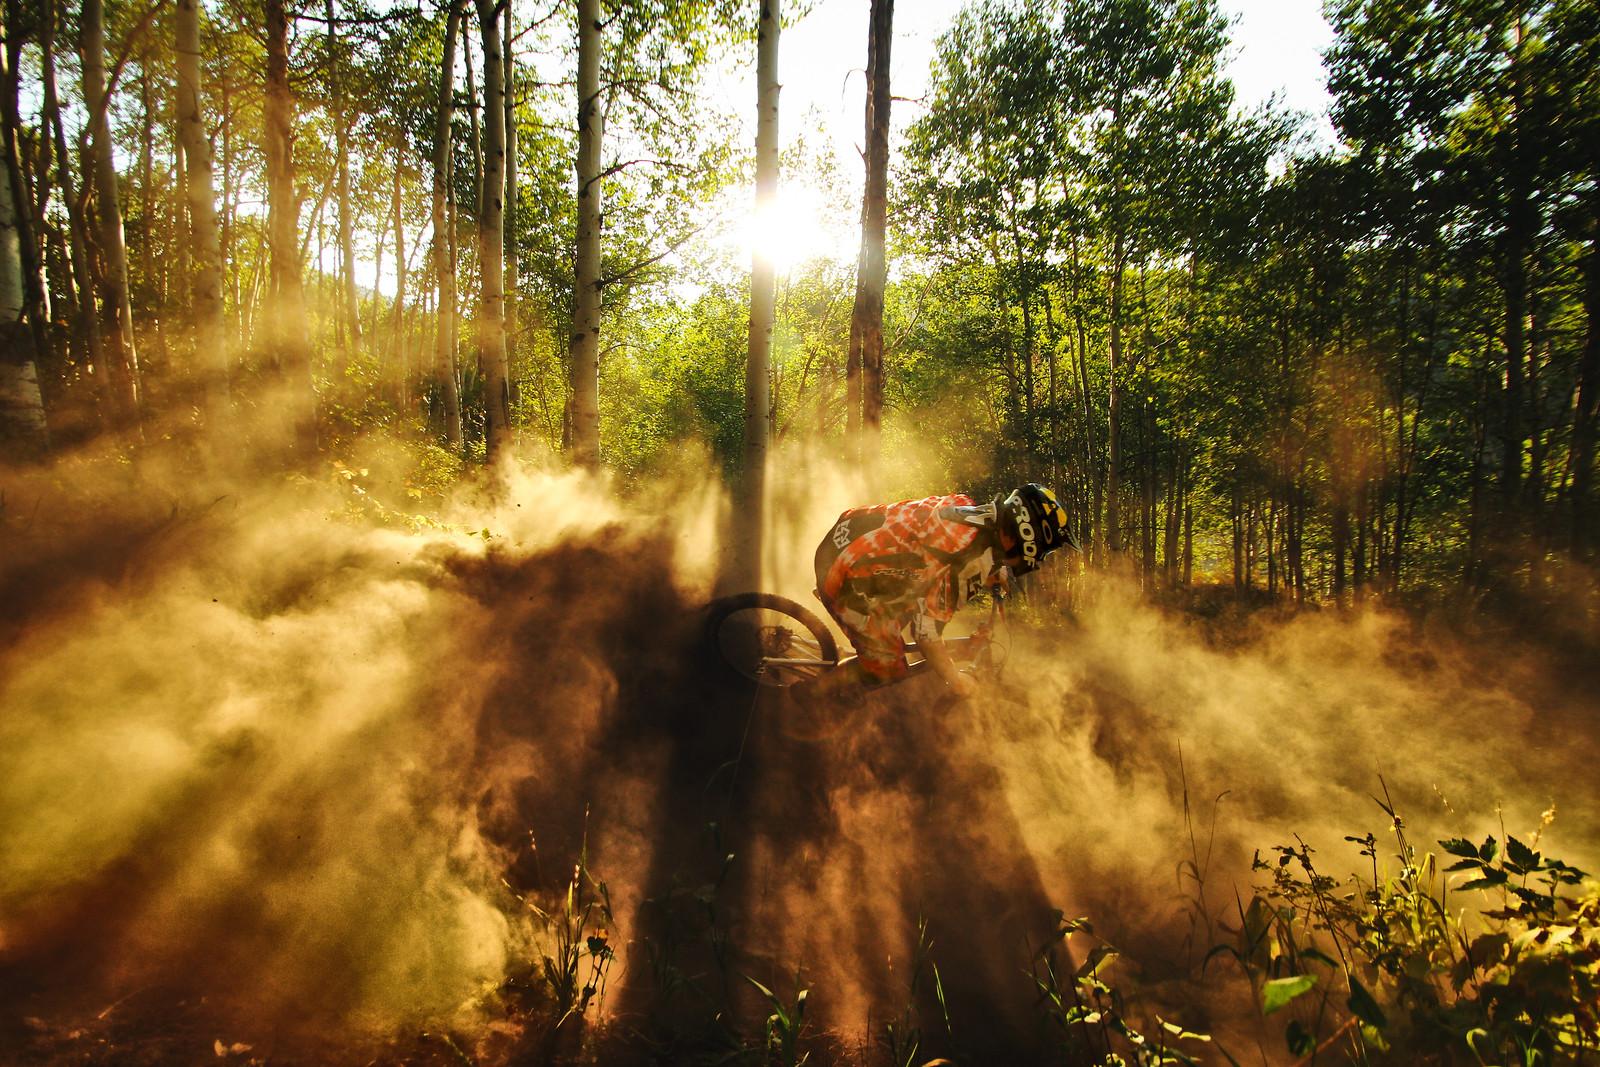 Railing a berm in the Jesus light - dirtjumpdaniel - Mountain Biking Pictures - Vital MTB